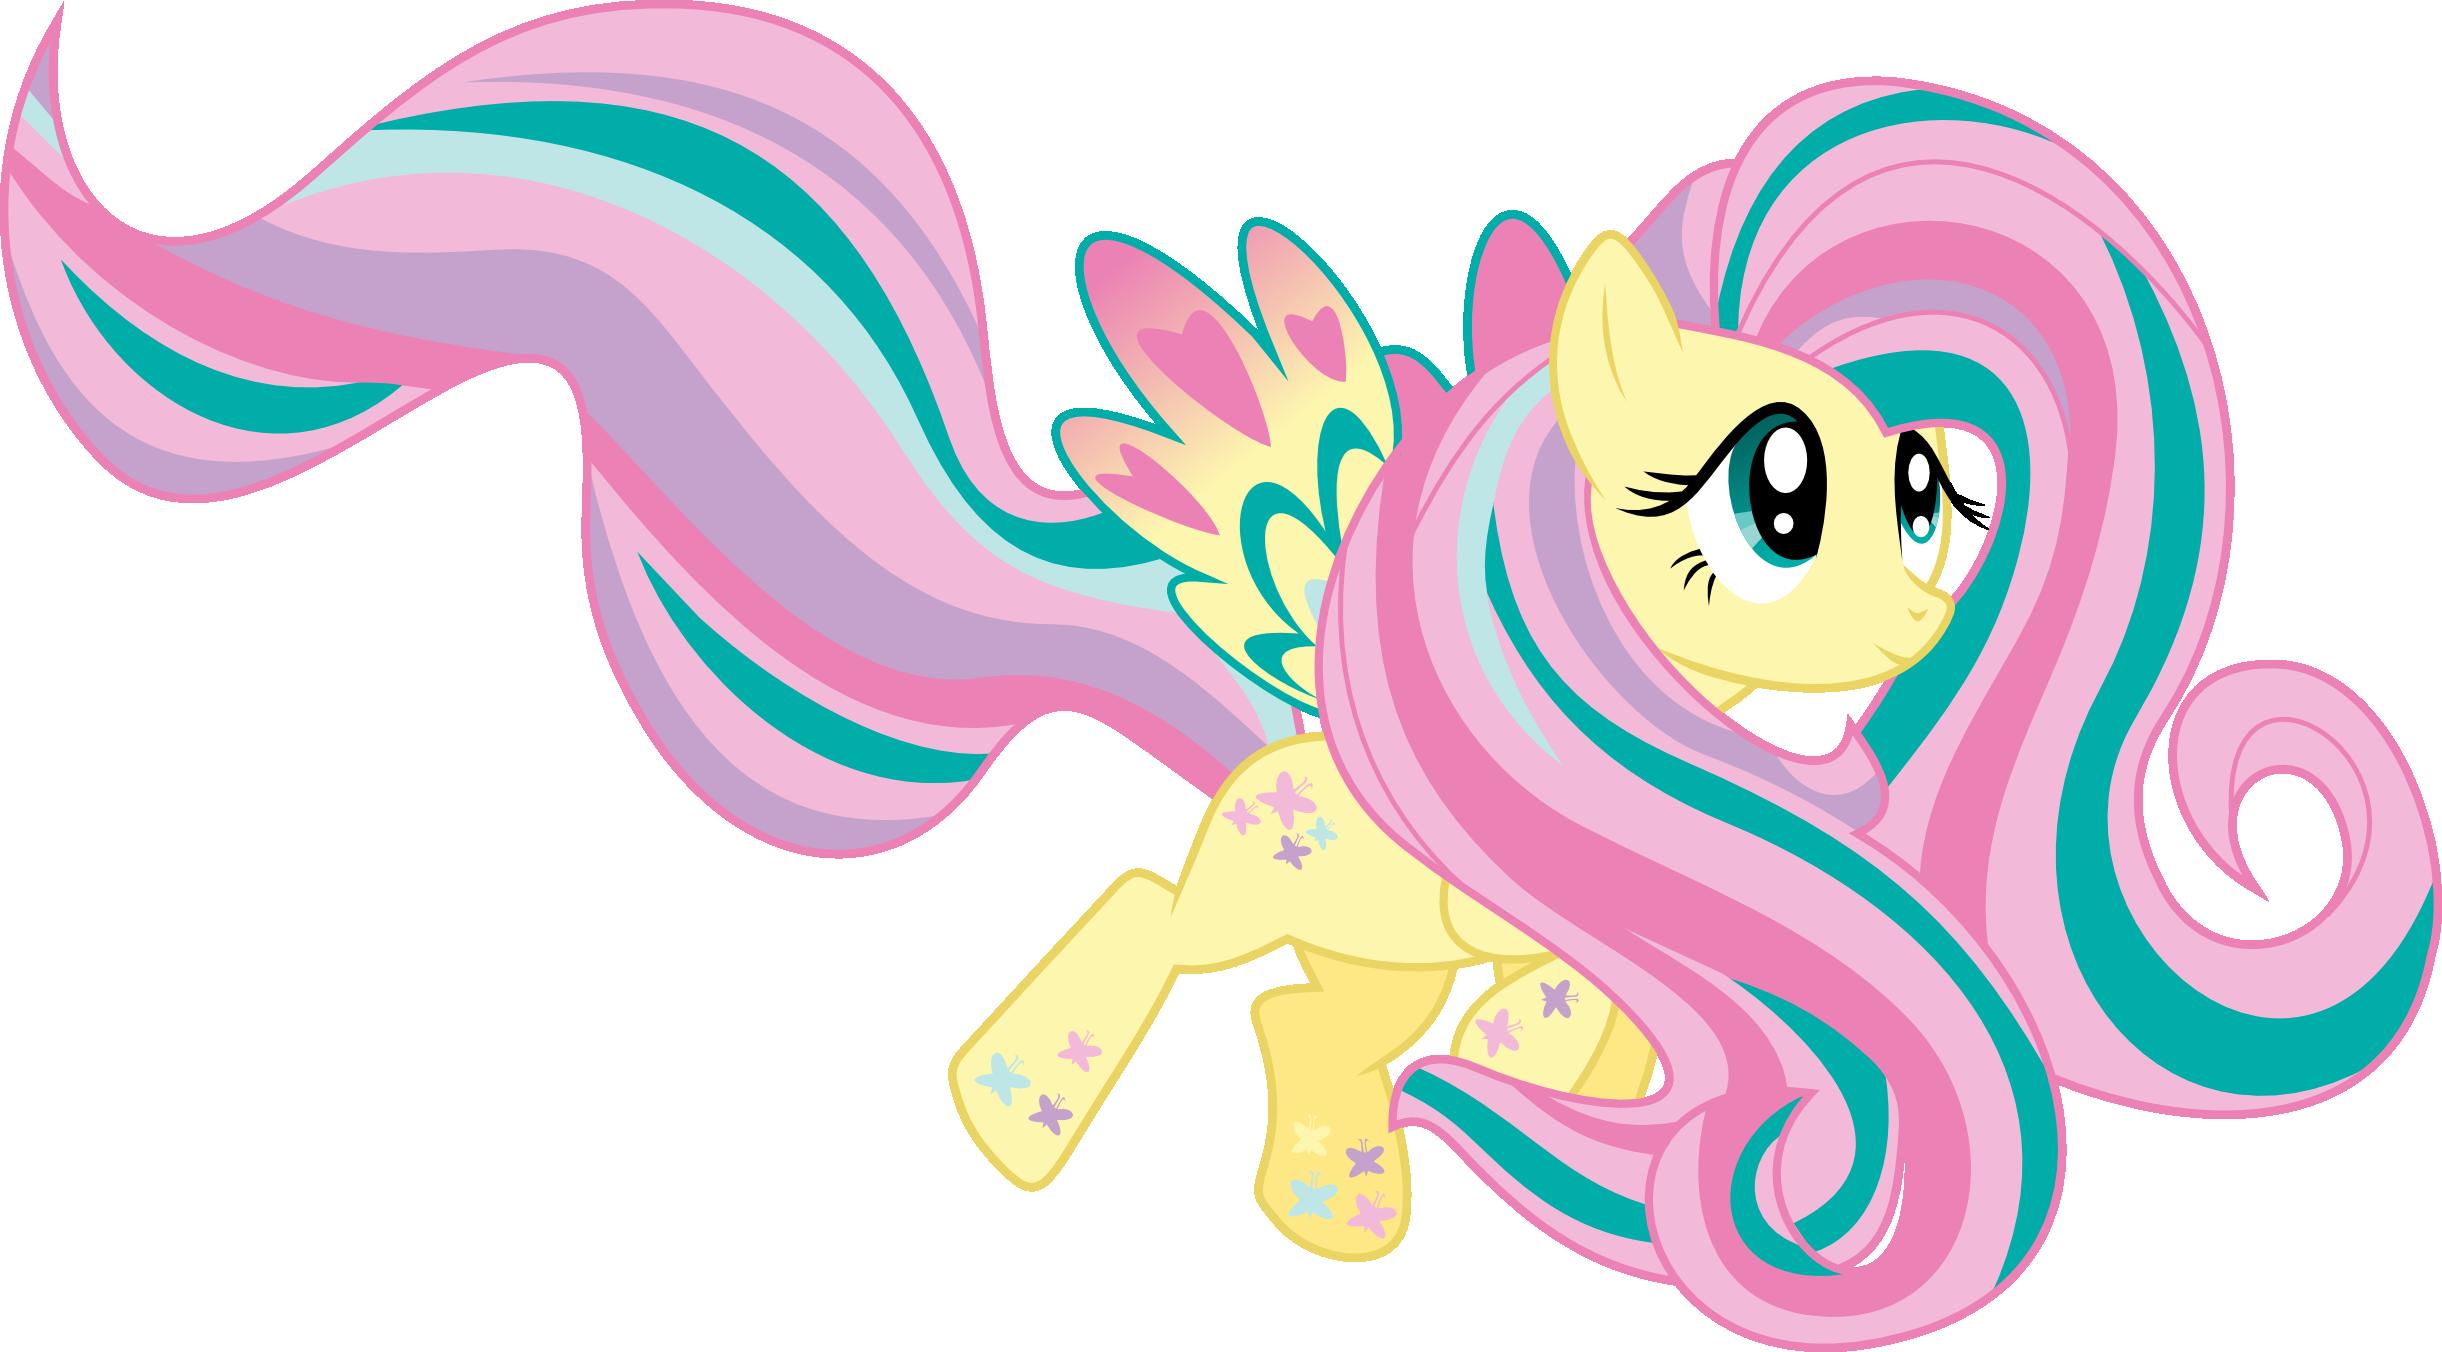 Rainbow Power Fluttershy by whizzball2 on DeviantArt